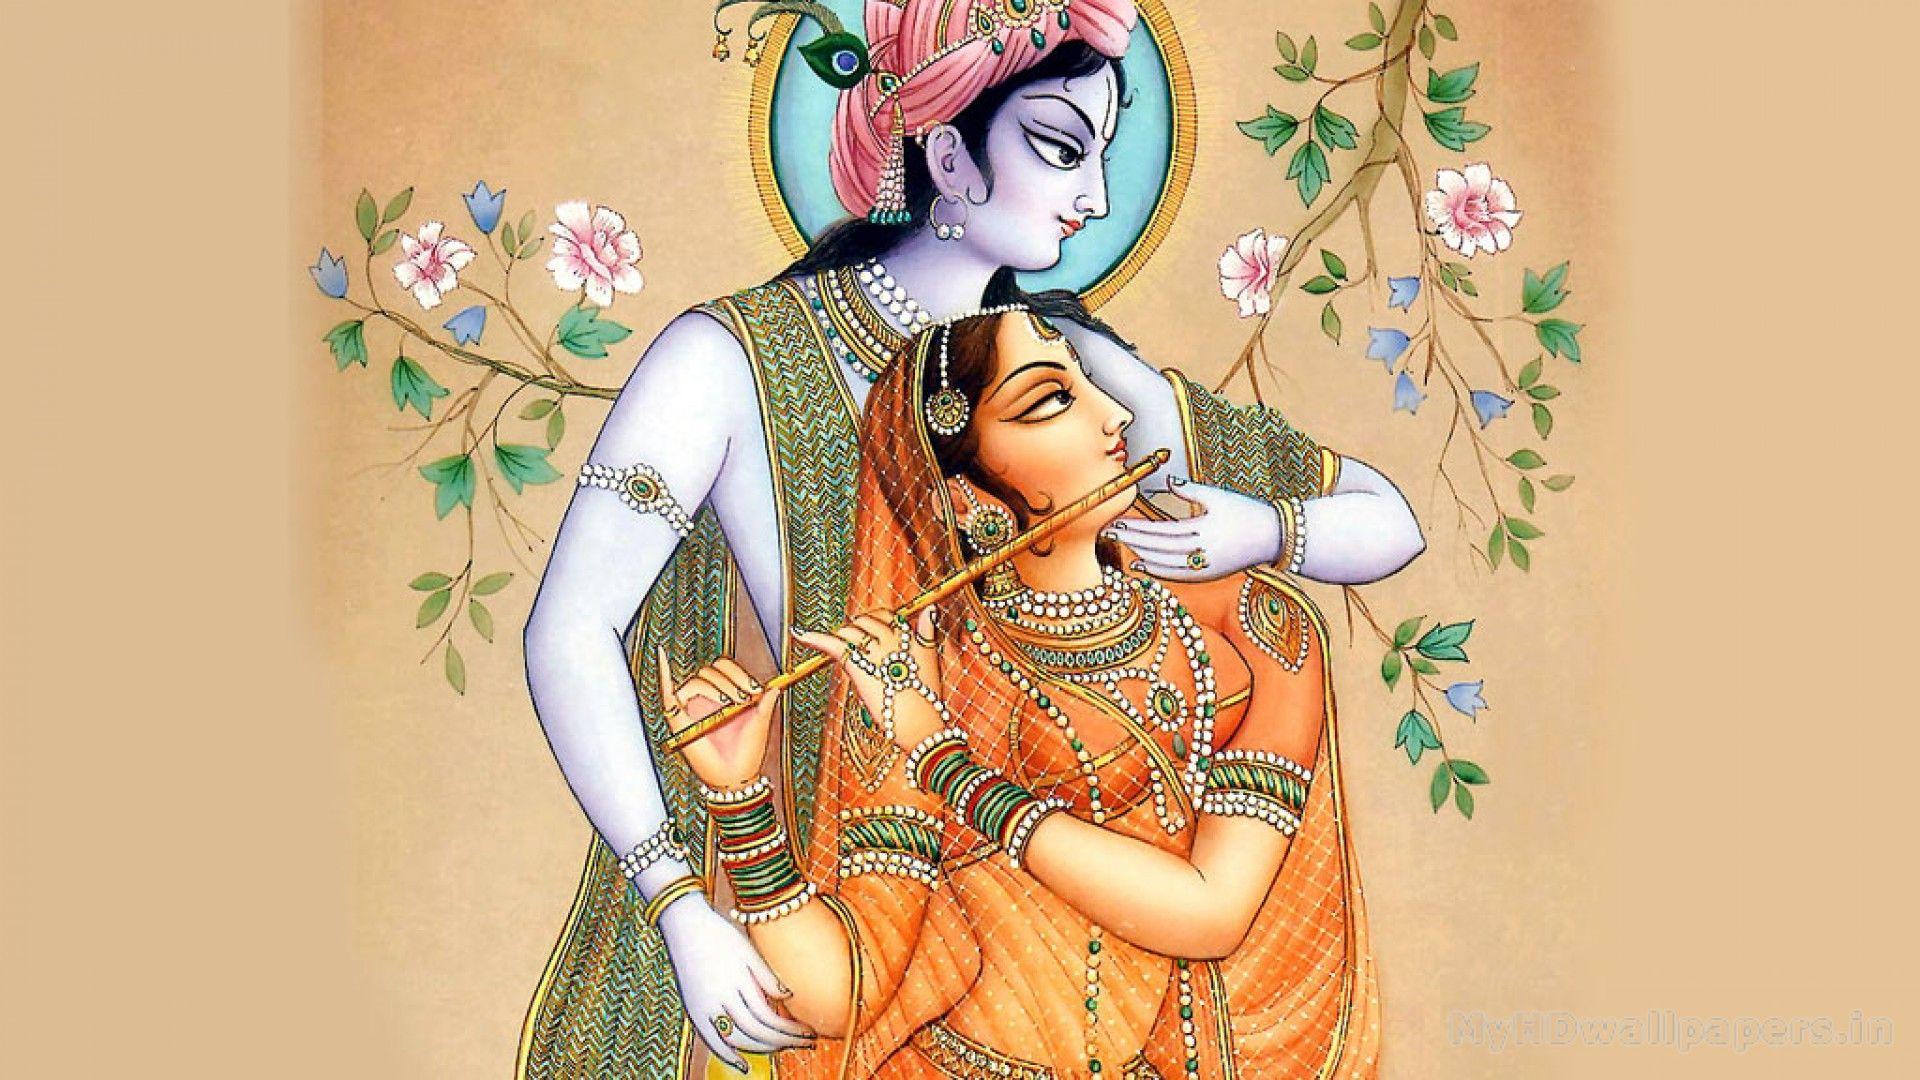 Radha krishna wallpapers full size - Radha Krishna Wallpaper Hd Full Size Http Www Superwallpapers In